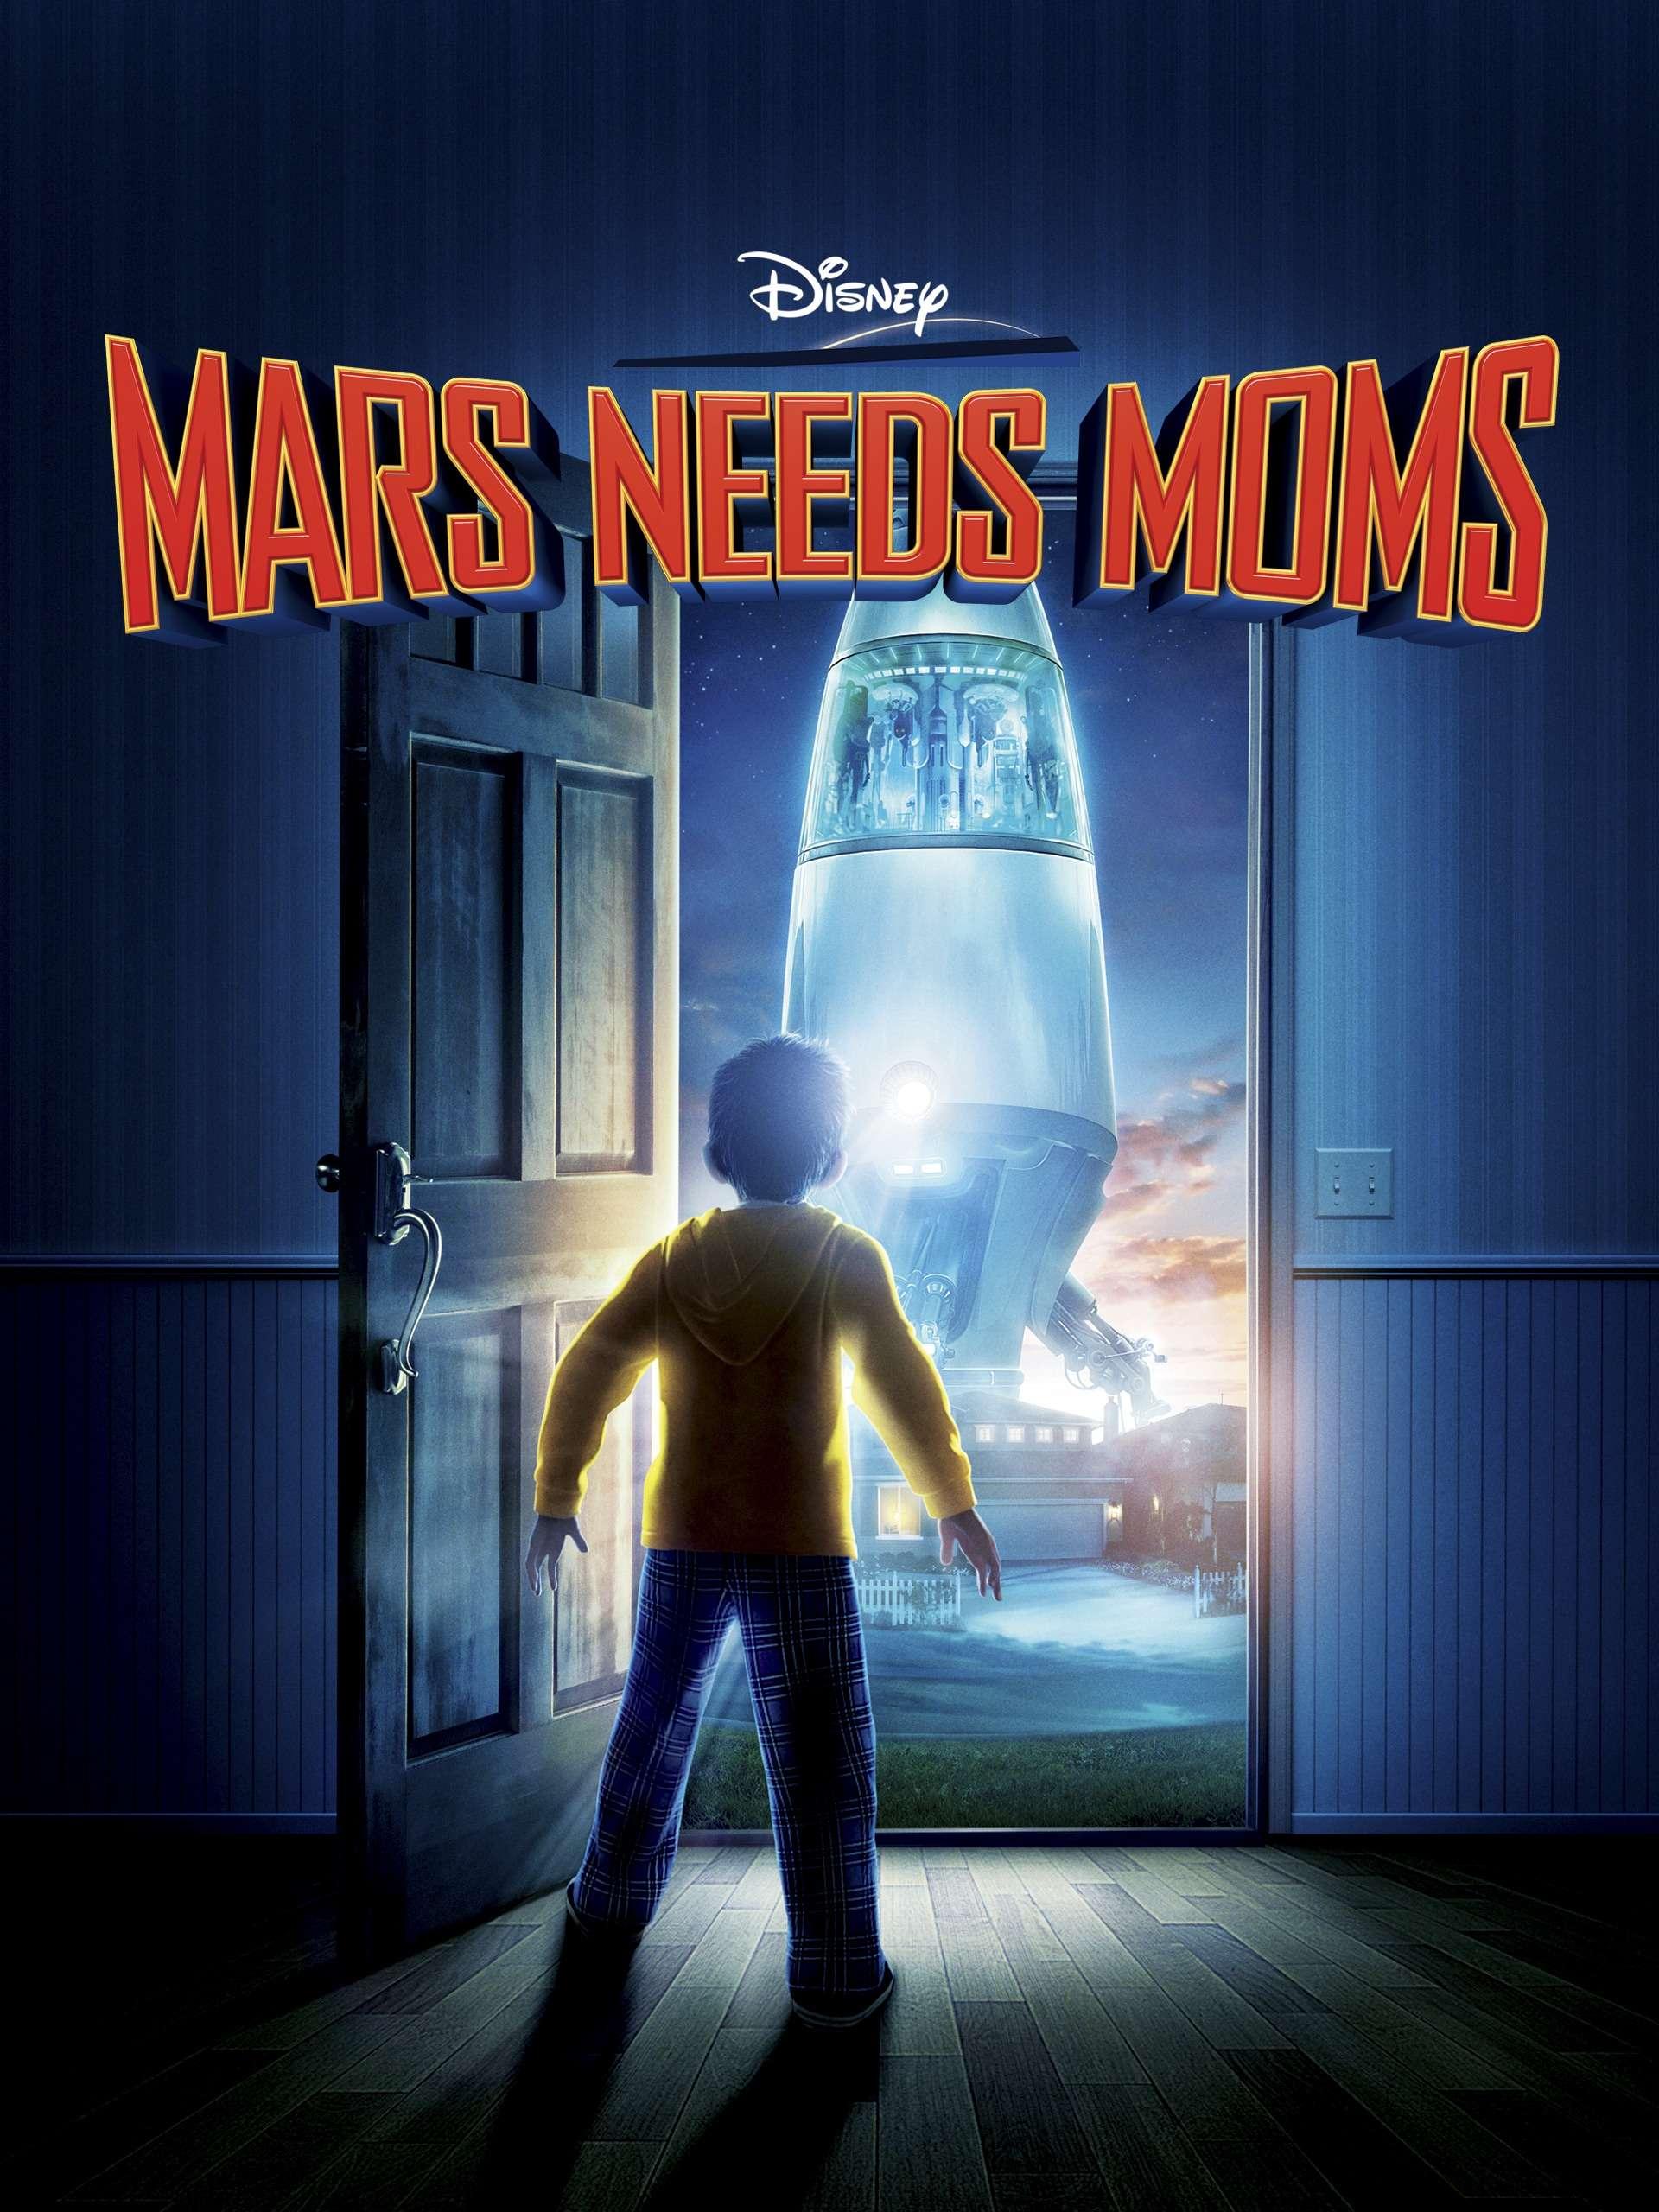 ميلو ورحلة الانقاذ Mars Needs Moms (2011) HDTV 1080p تحميل تورنت 1 arabp2p.com